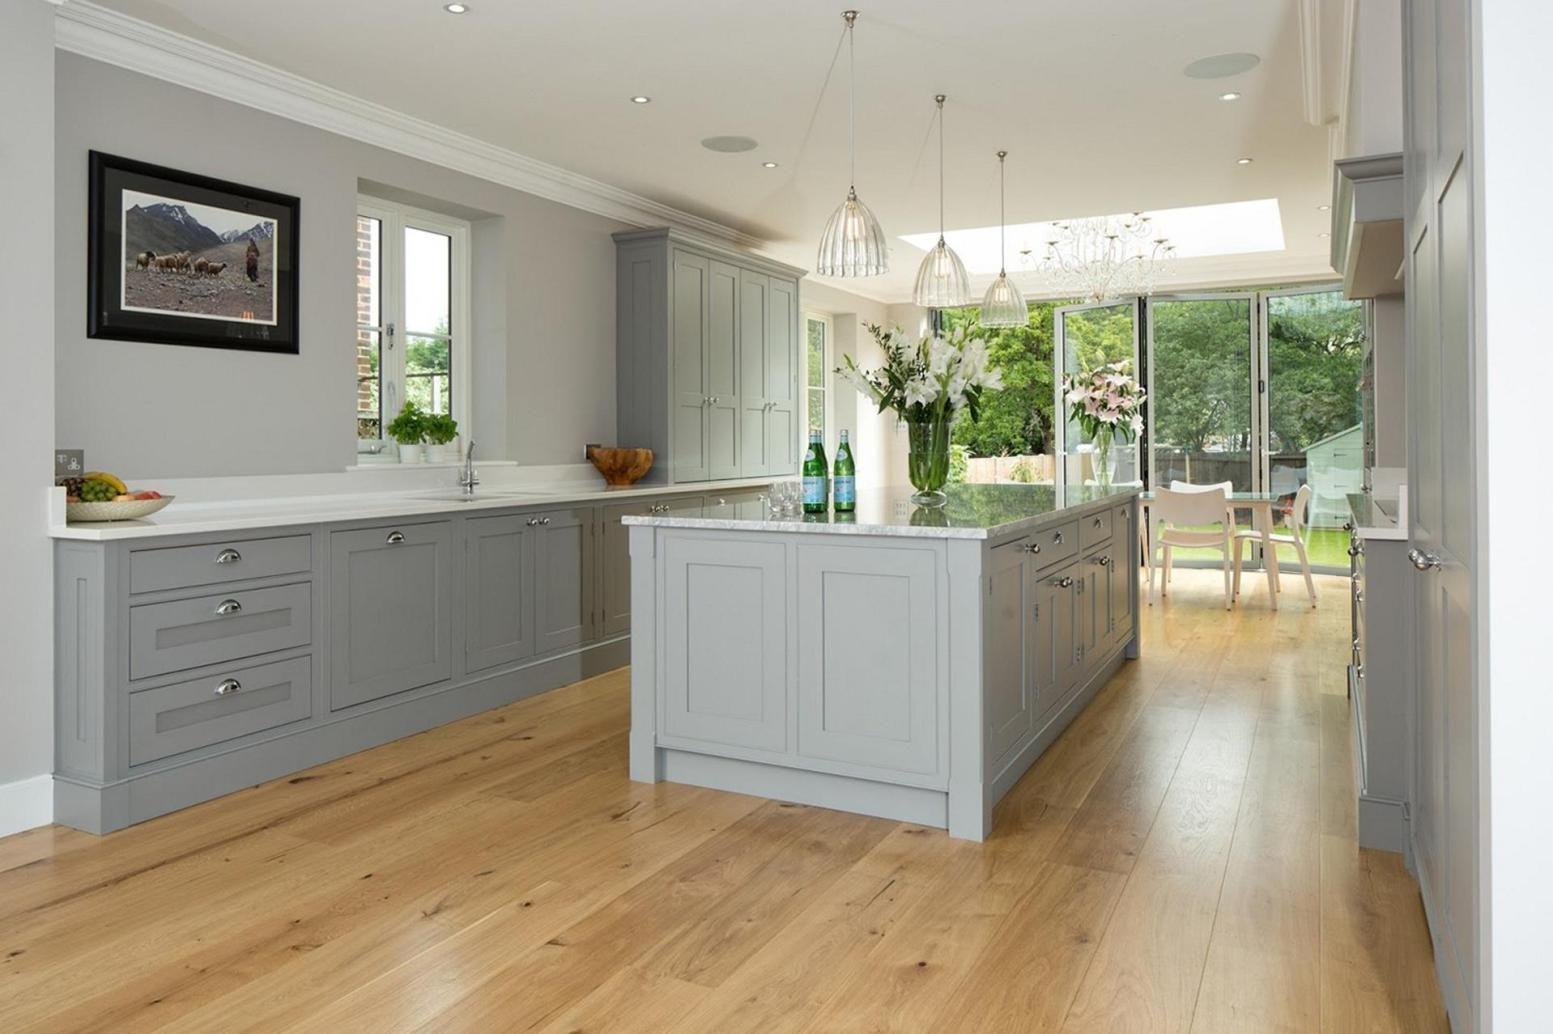 50 Perfect Light Grey Kitchen Cabinets Ideas Kitchencabinets Shaker Style Kitchen Cabinets Grey Shaker Kitchen Light Grey Kitchens